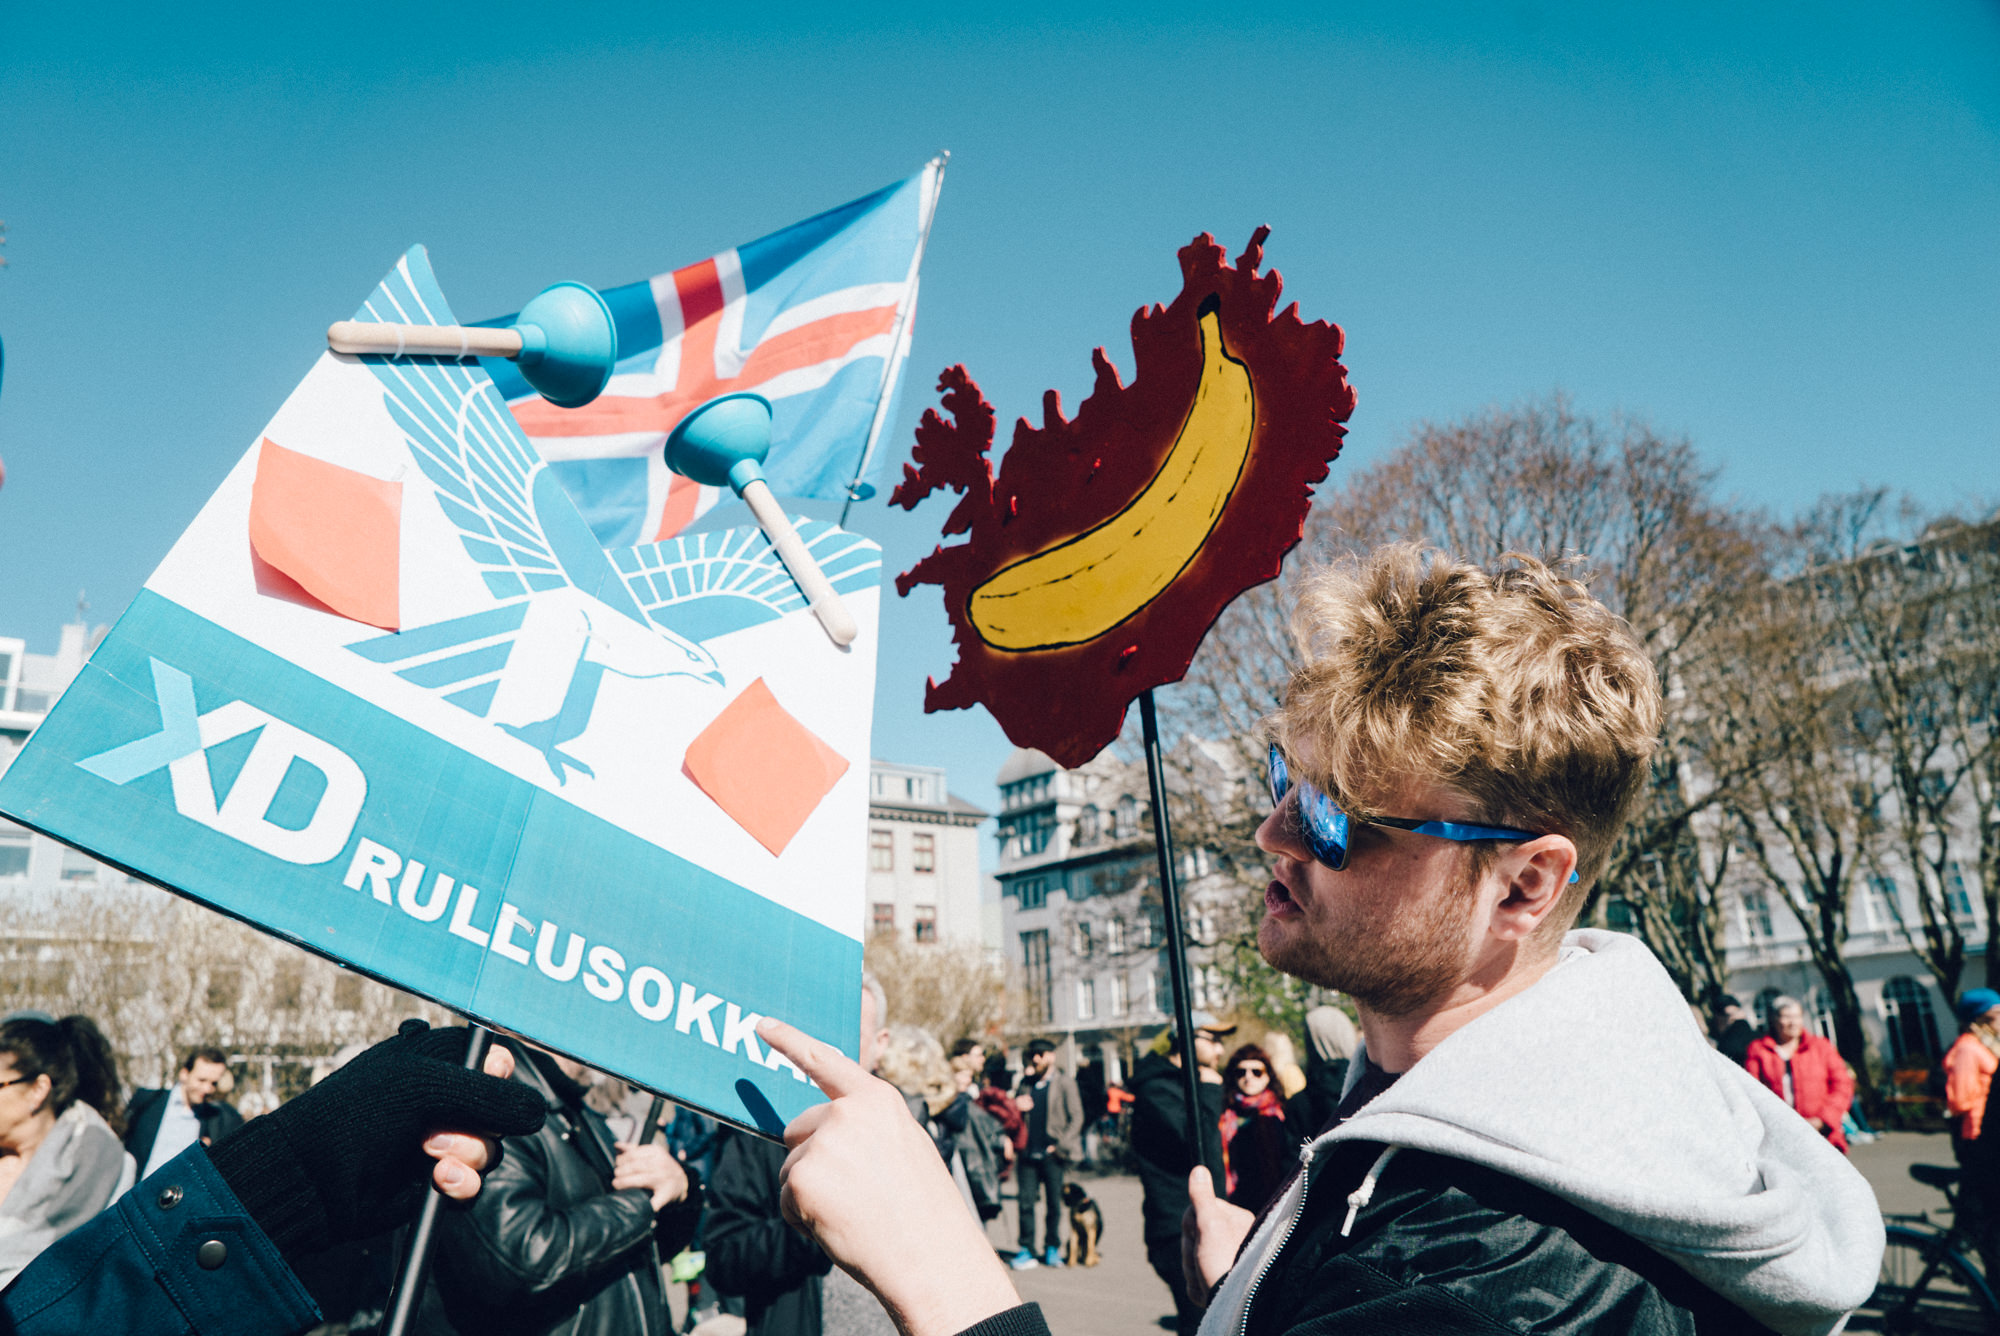 wrenee-iceland-part-1-reykjavik-protest-5.jpg